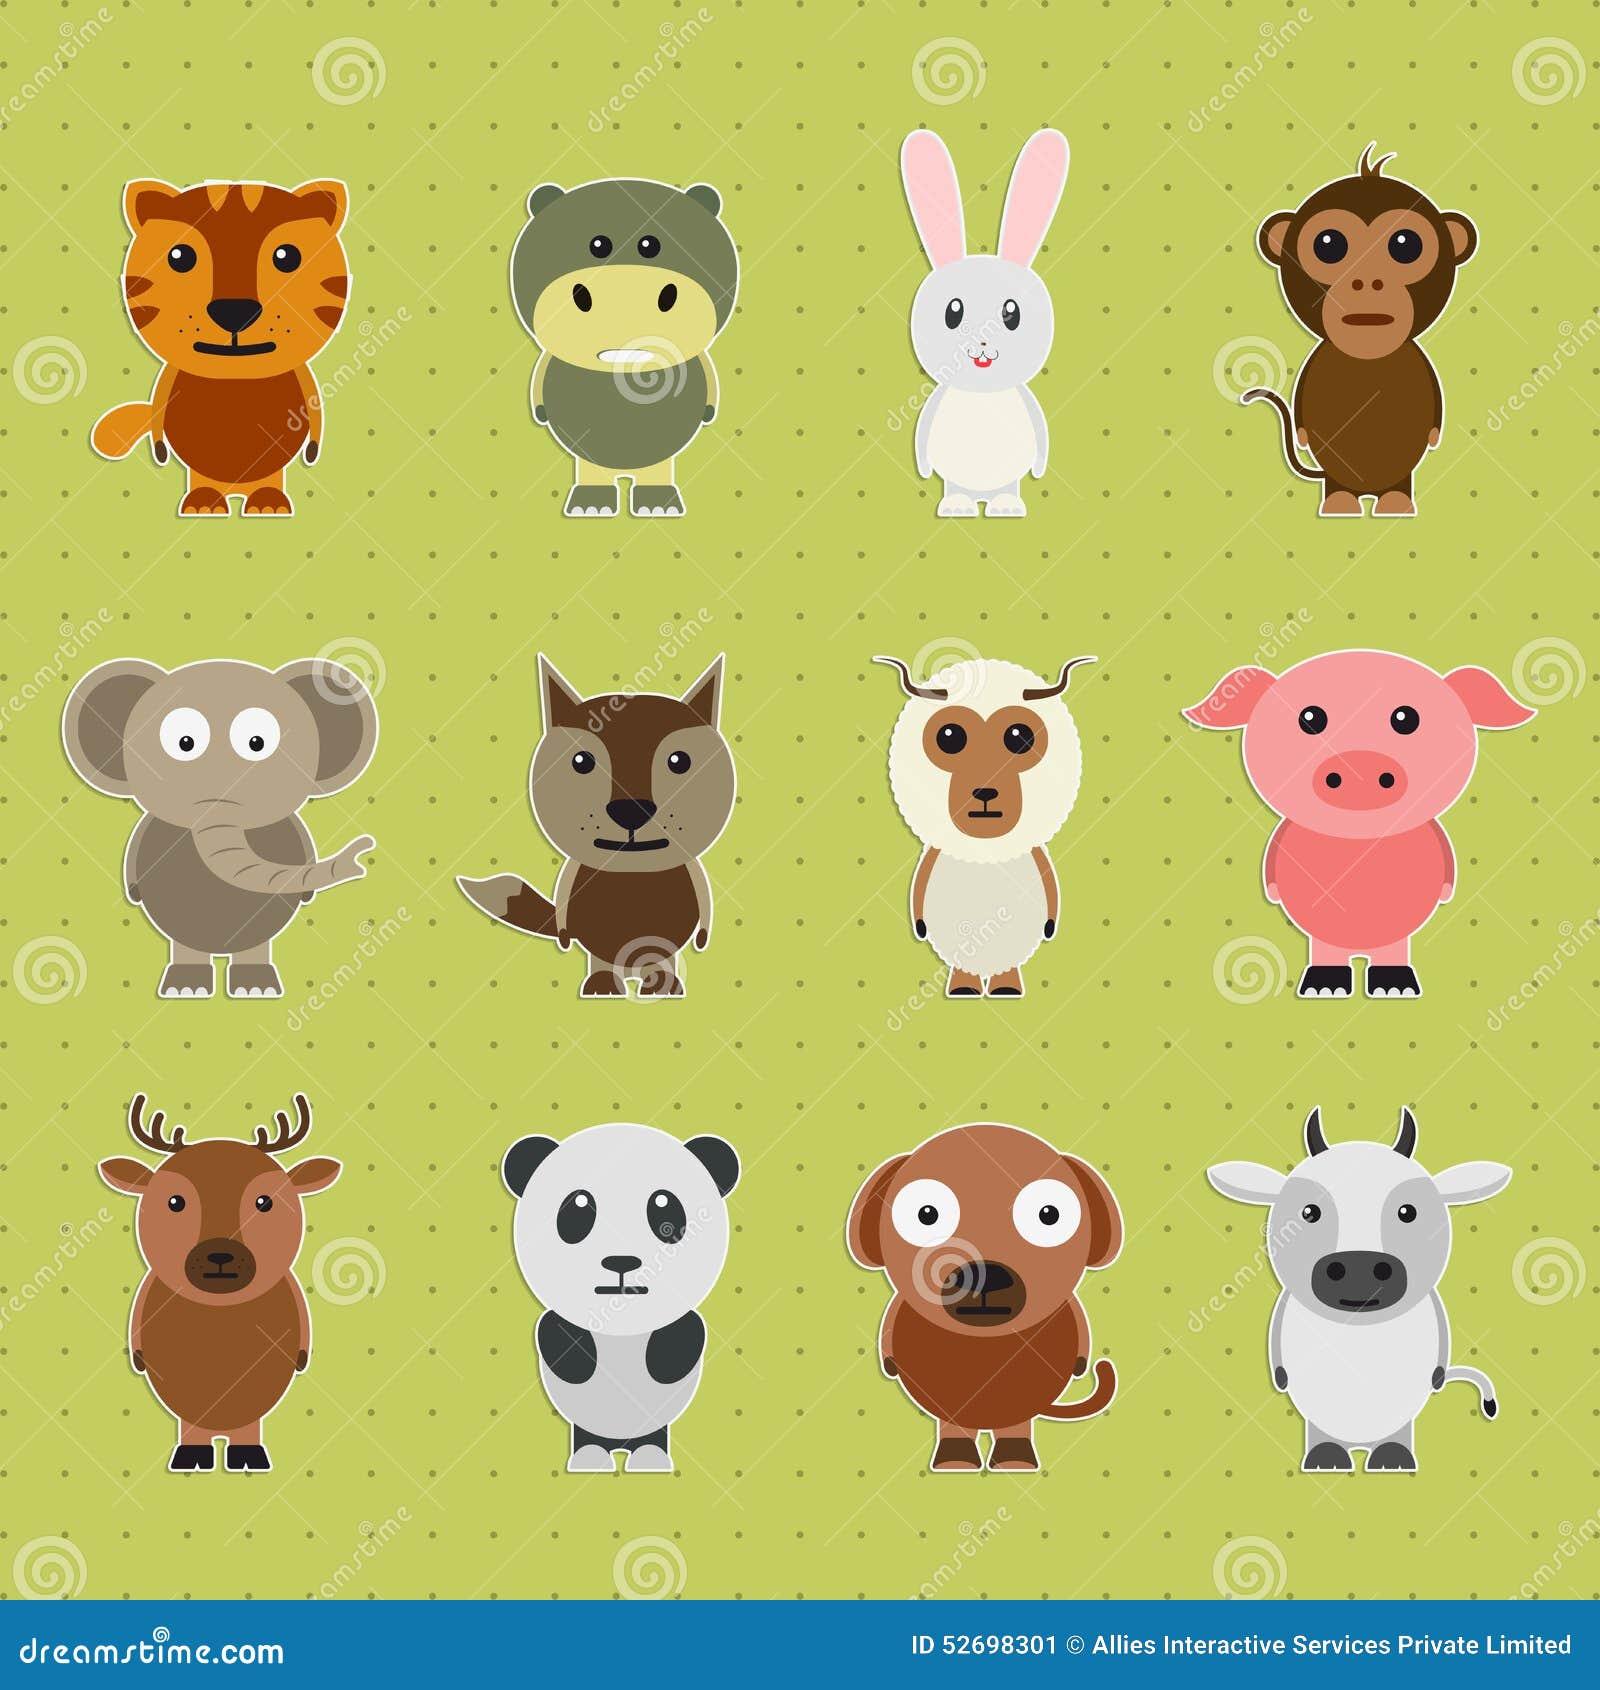 Insieme dei personaggi cartoni animati animali